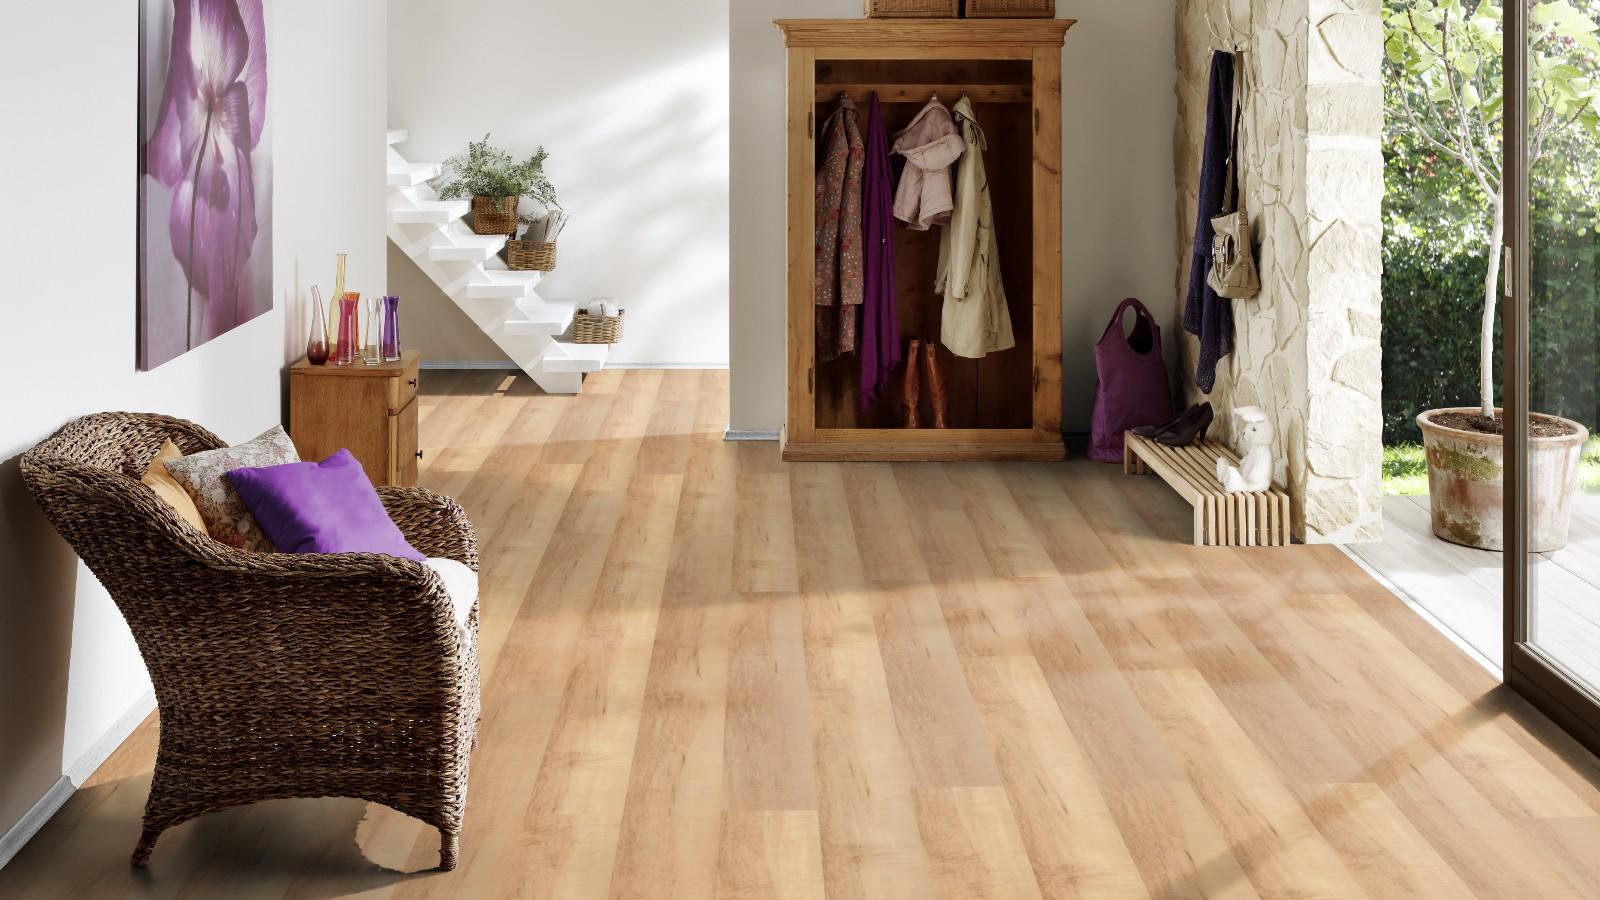 terh rne avatara floor ahorn hellbraun 1 stab a06 fresh edition ter h rne avatara floor. Black Bedroom Furniture Sets. Home Design Ideas